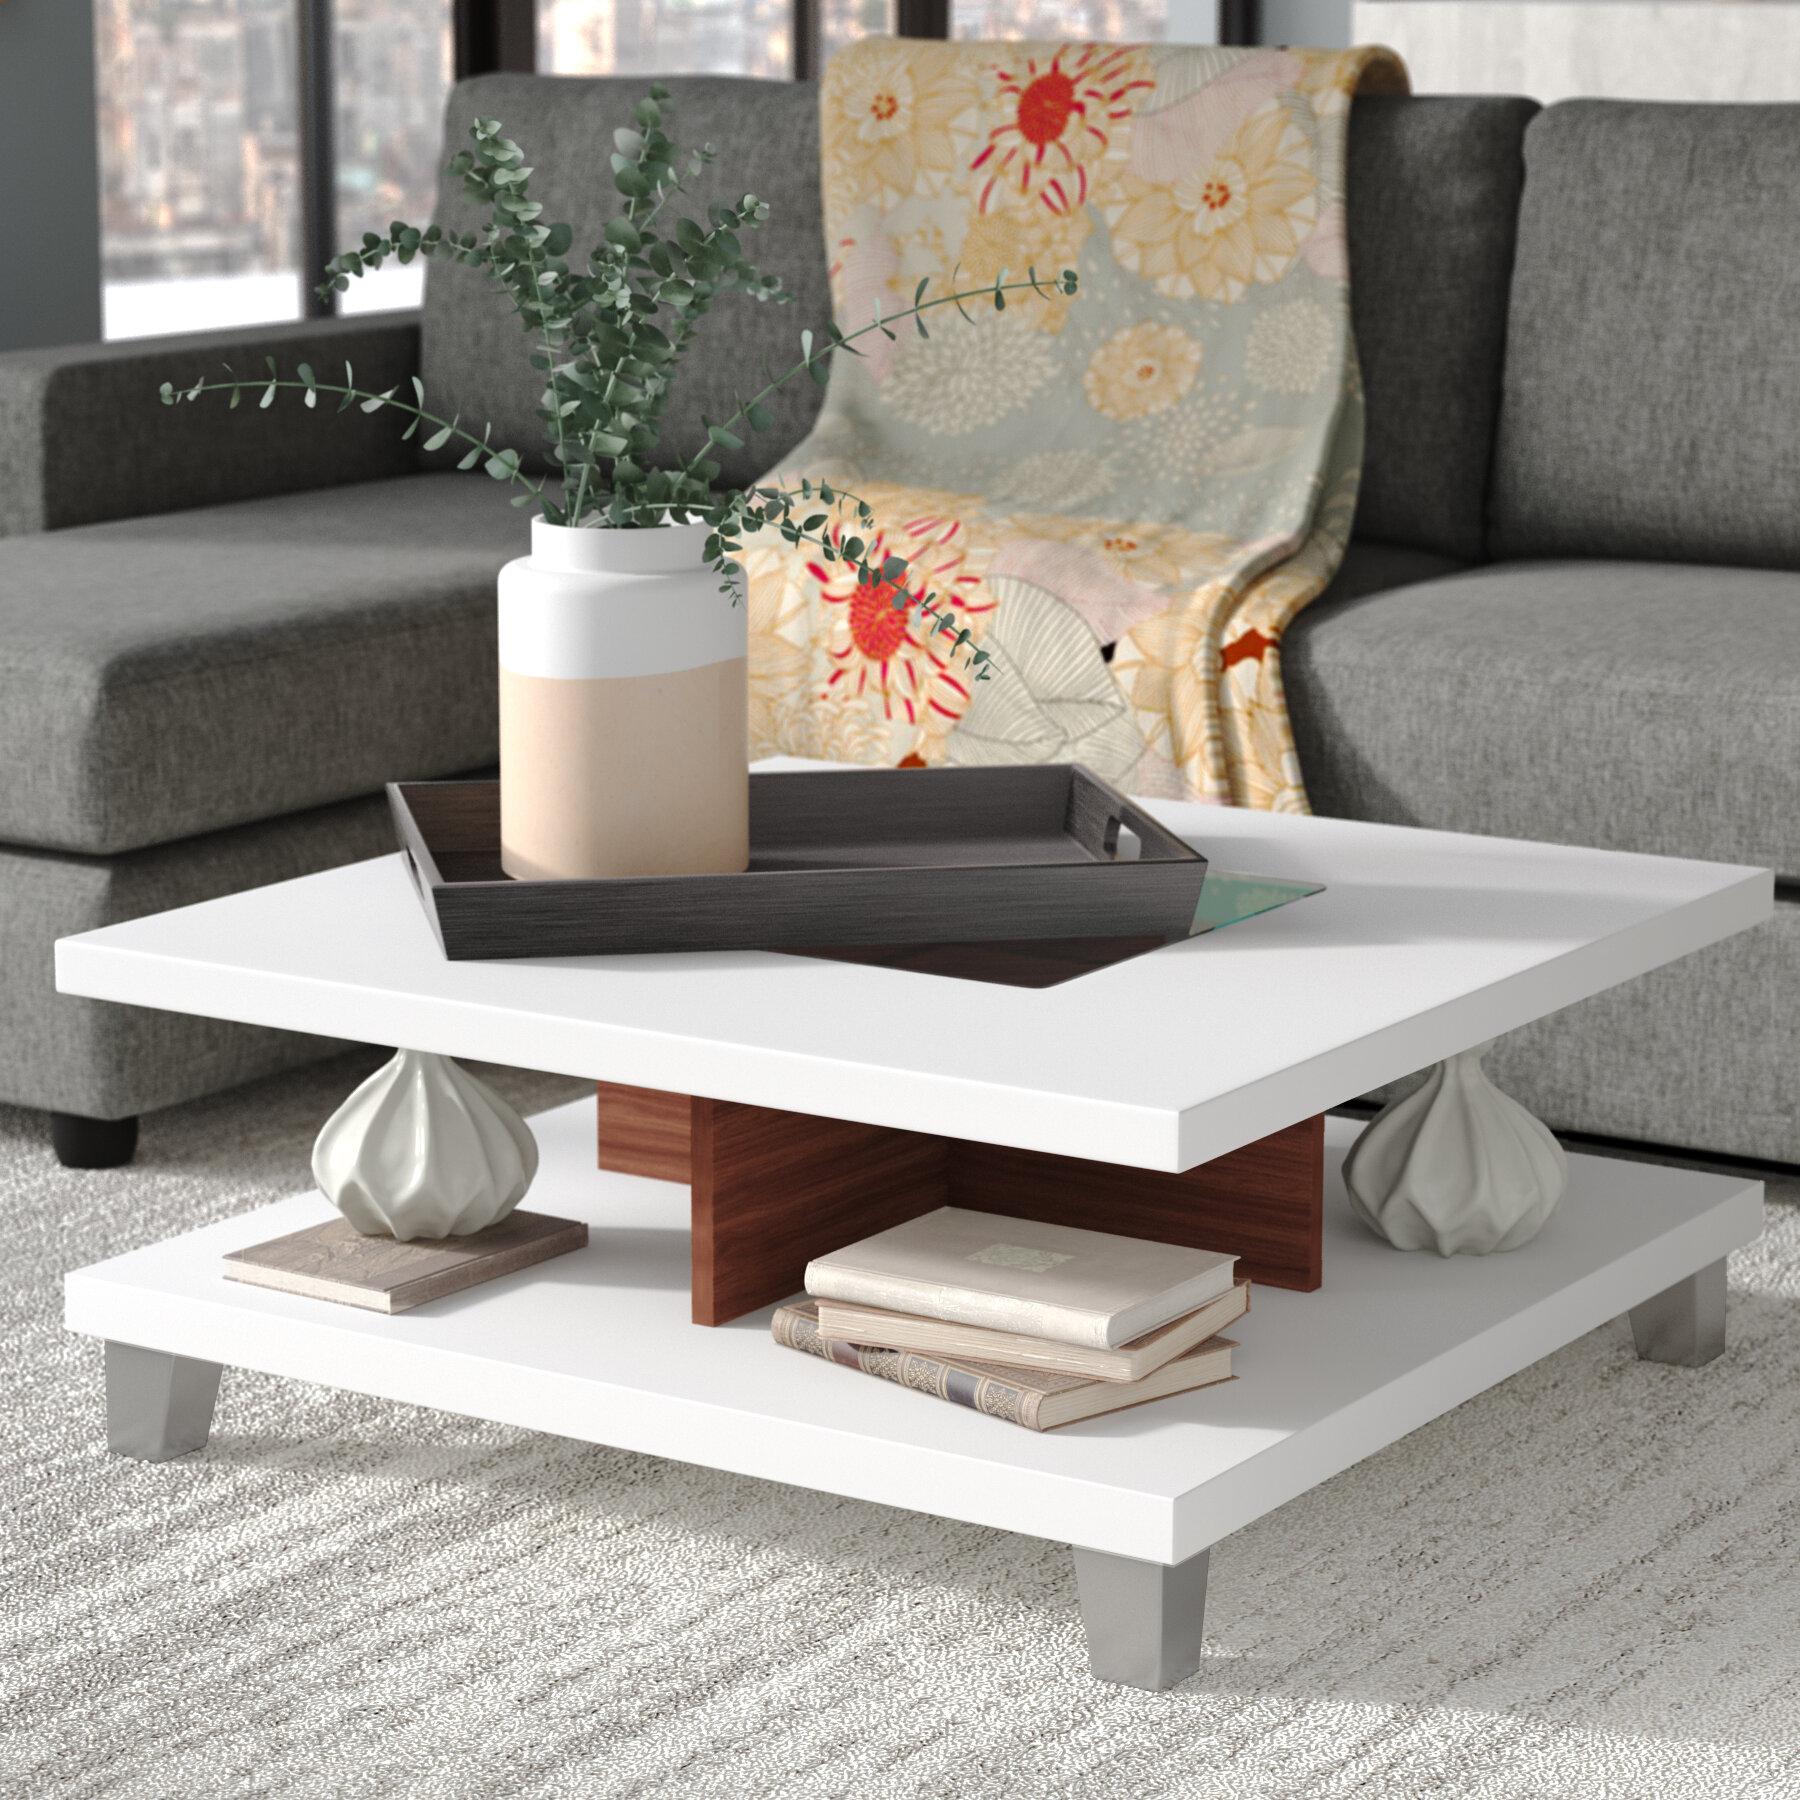 Exceptionnel Ivy Bronx Cuffie Coffee Table U0026 Reviews | Wayfair